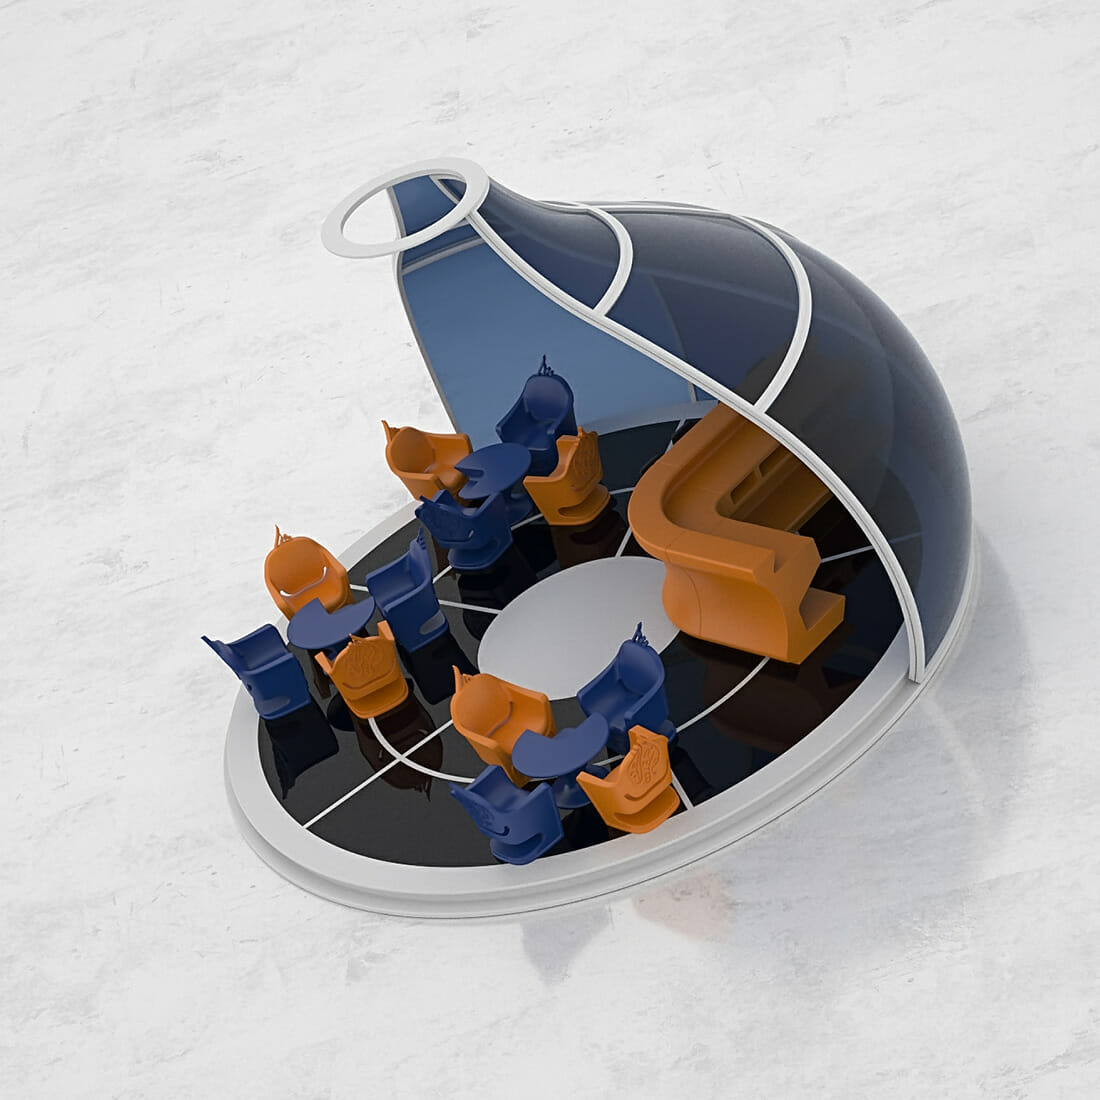 TAJINE Structure Event Designer Alberto De Siati